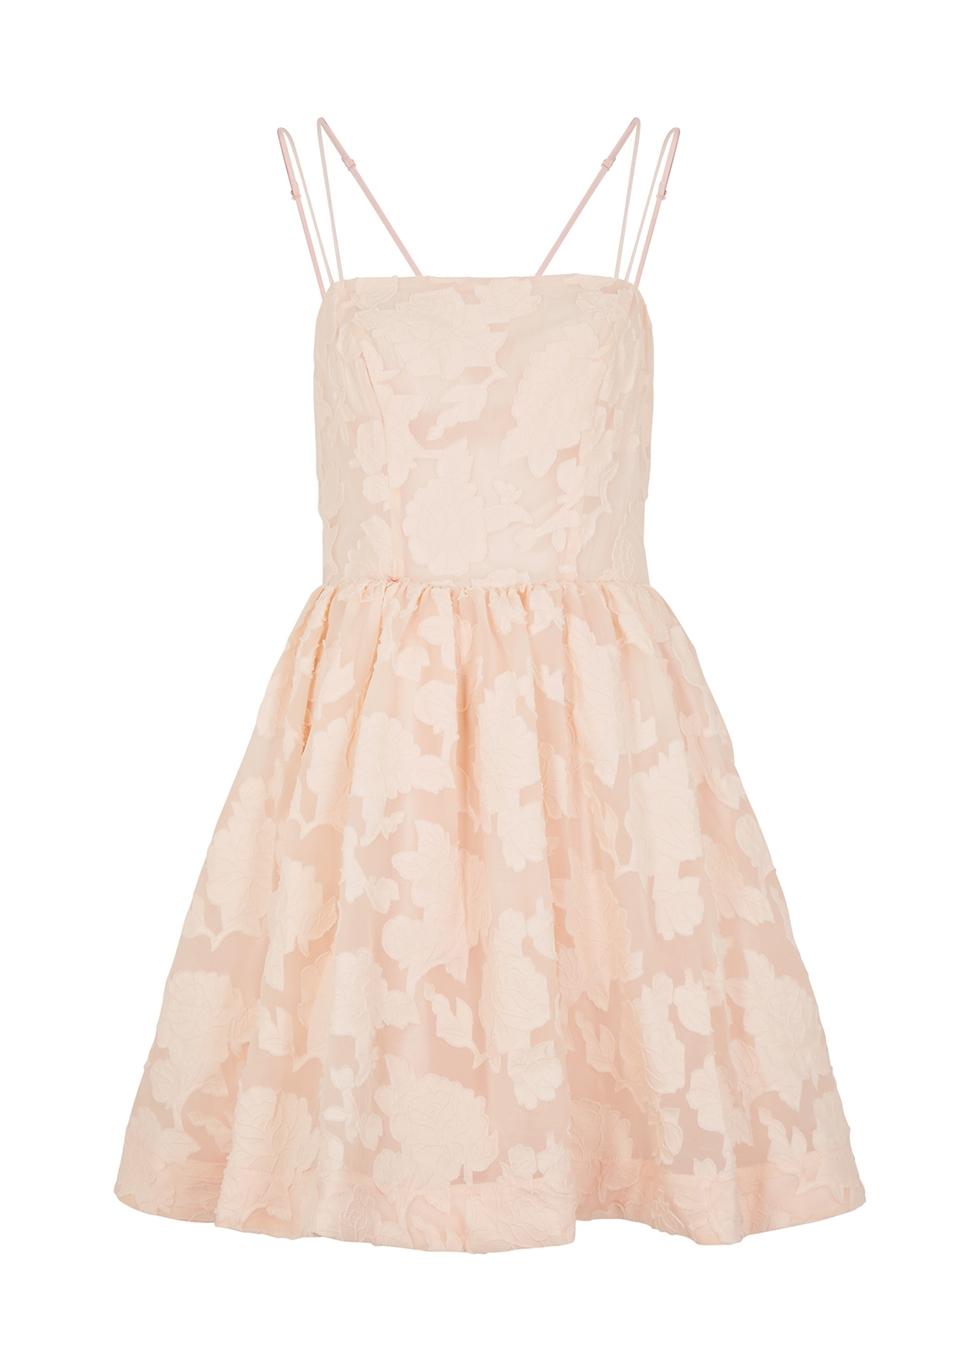 Offset blush fil coupé mini dress